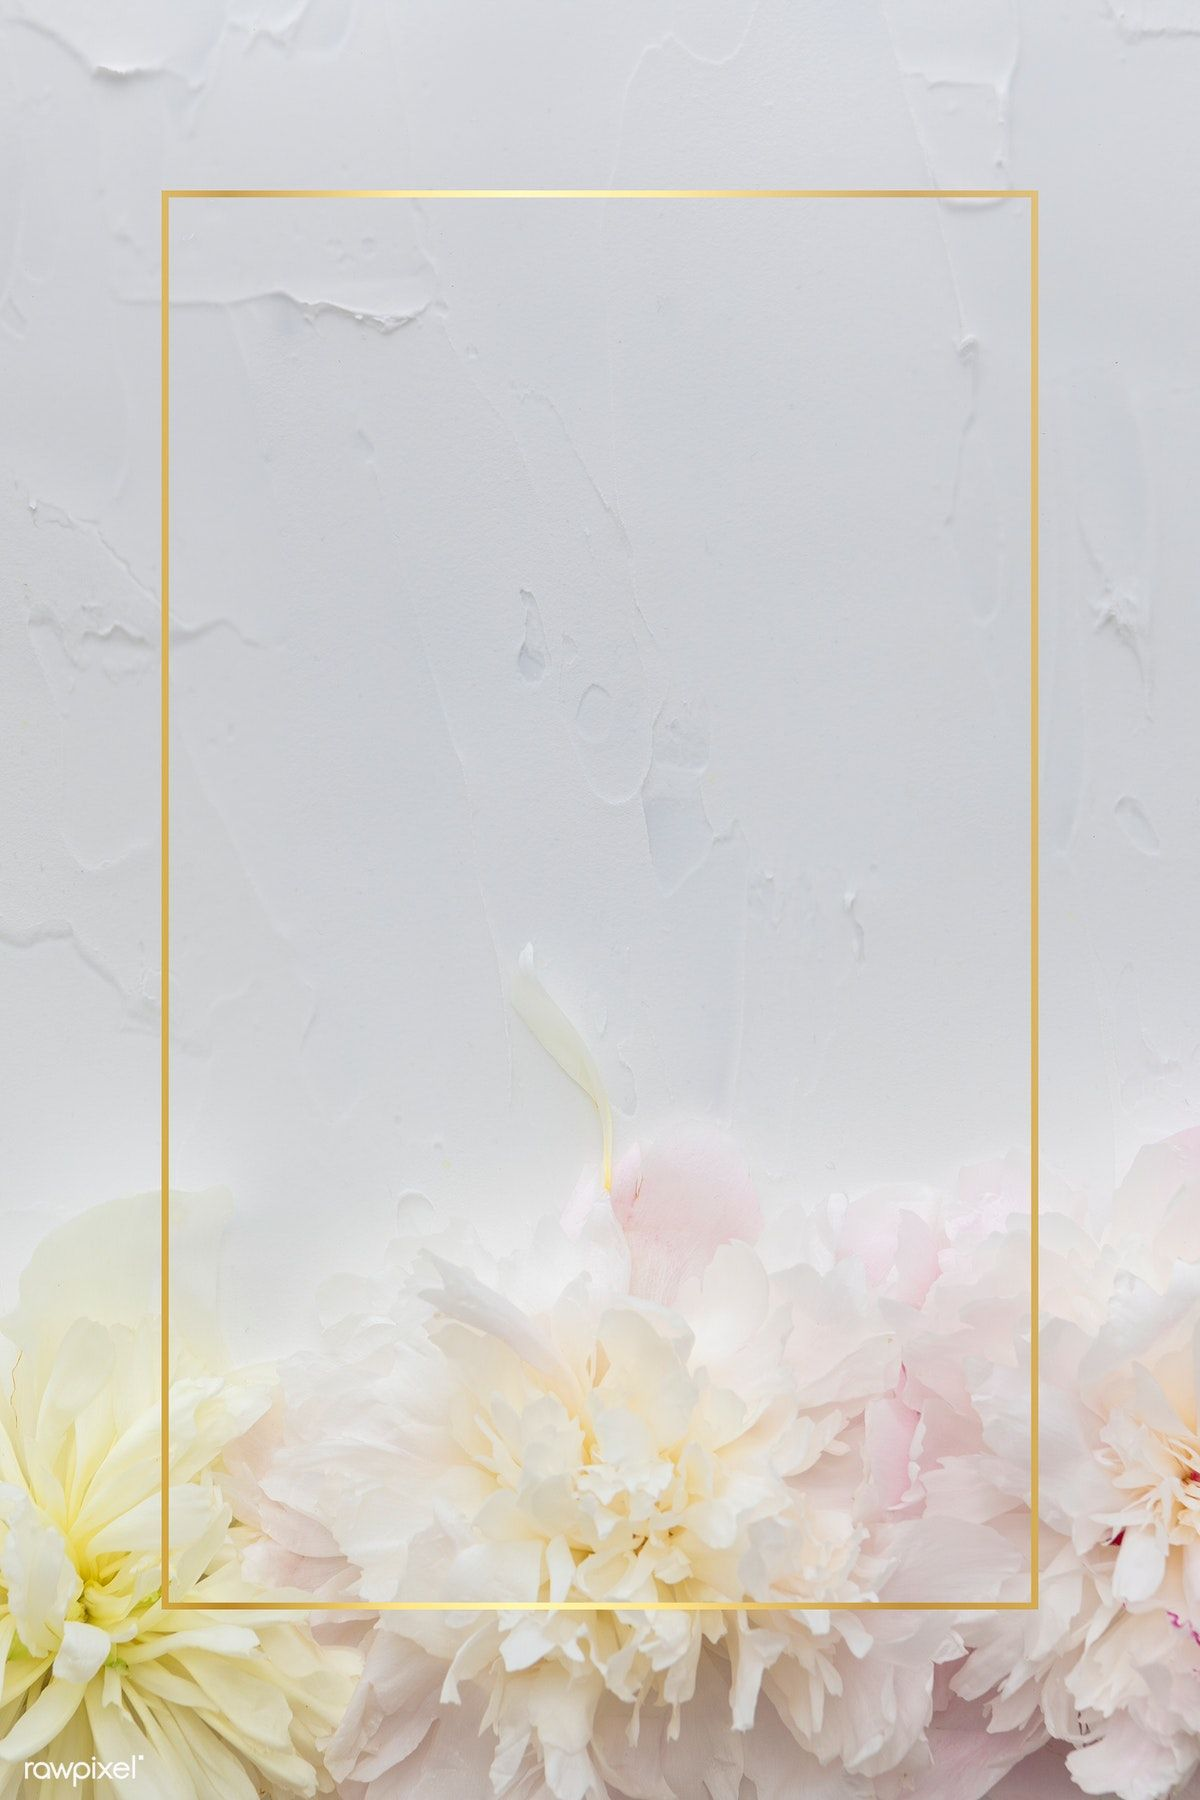 Download Premium Psd Of Blank Beautiful Flowers Frame Mockup 1212348 Flower Frame Frame Mockups Flower Illustration